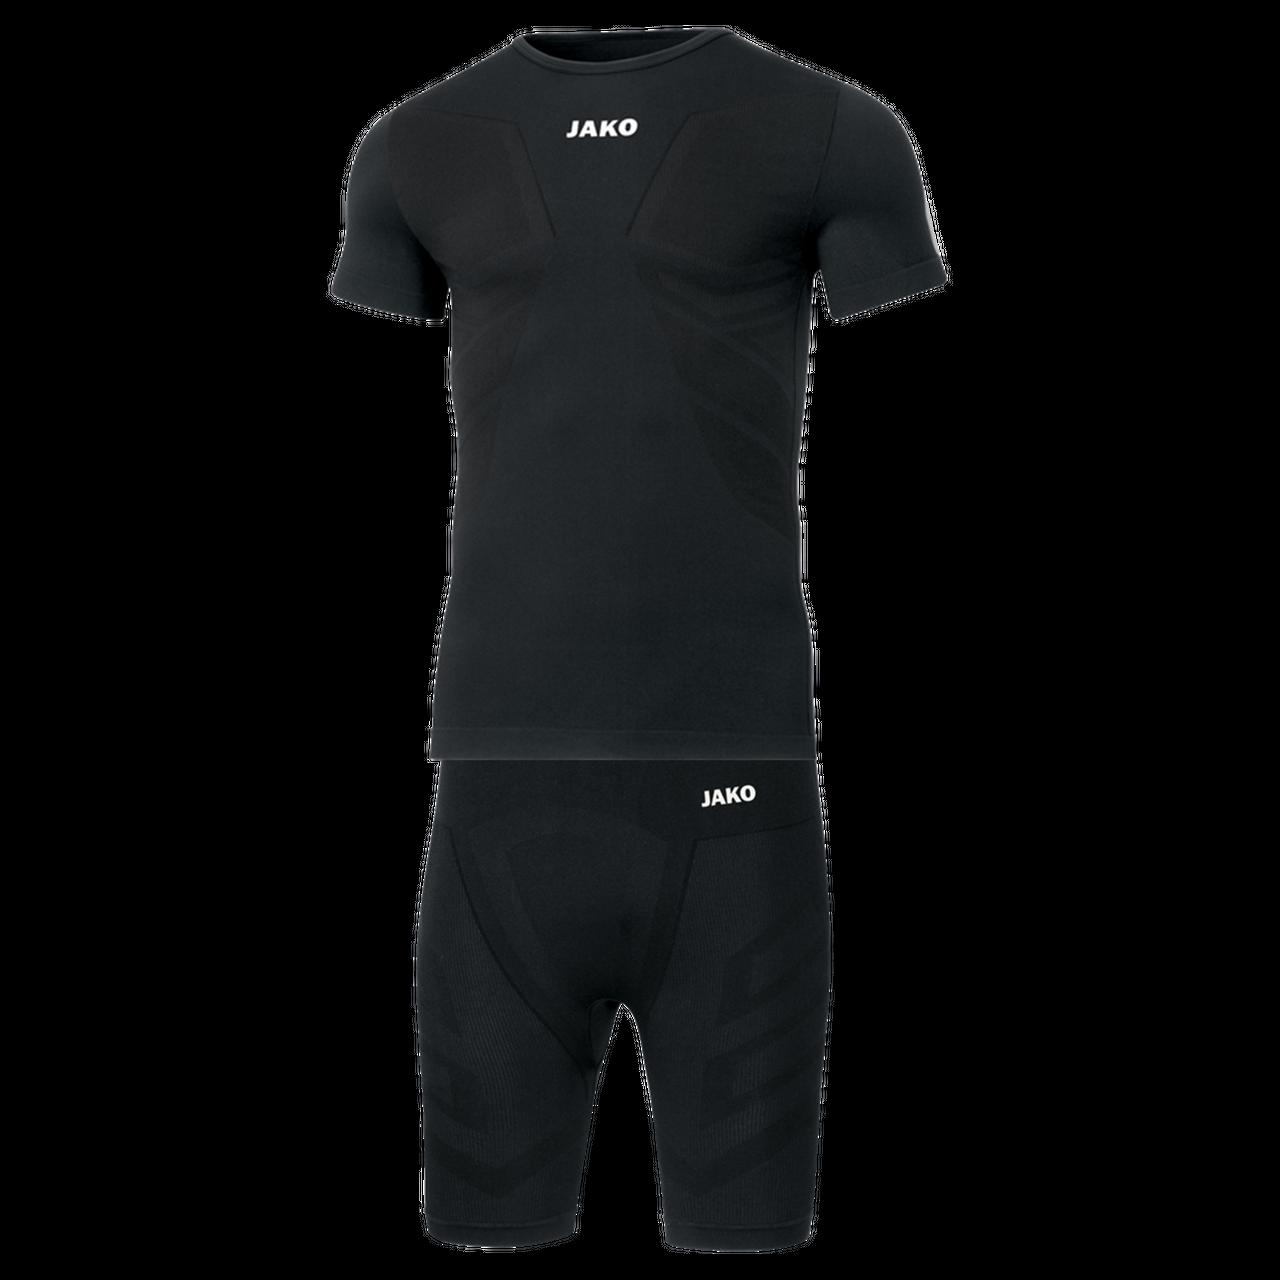 [Set] JAKO T-Shirt comfort 2.0 + Short Toght Comfort 2.0